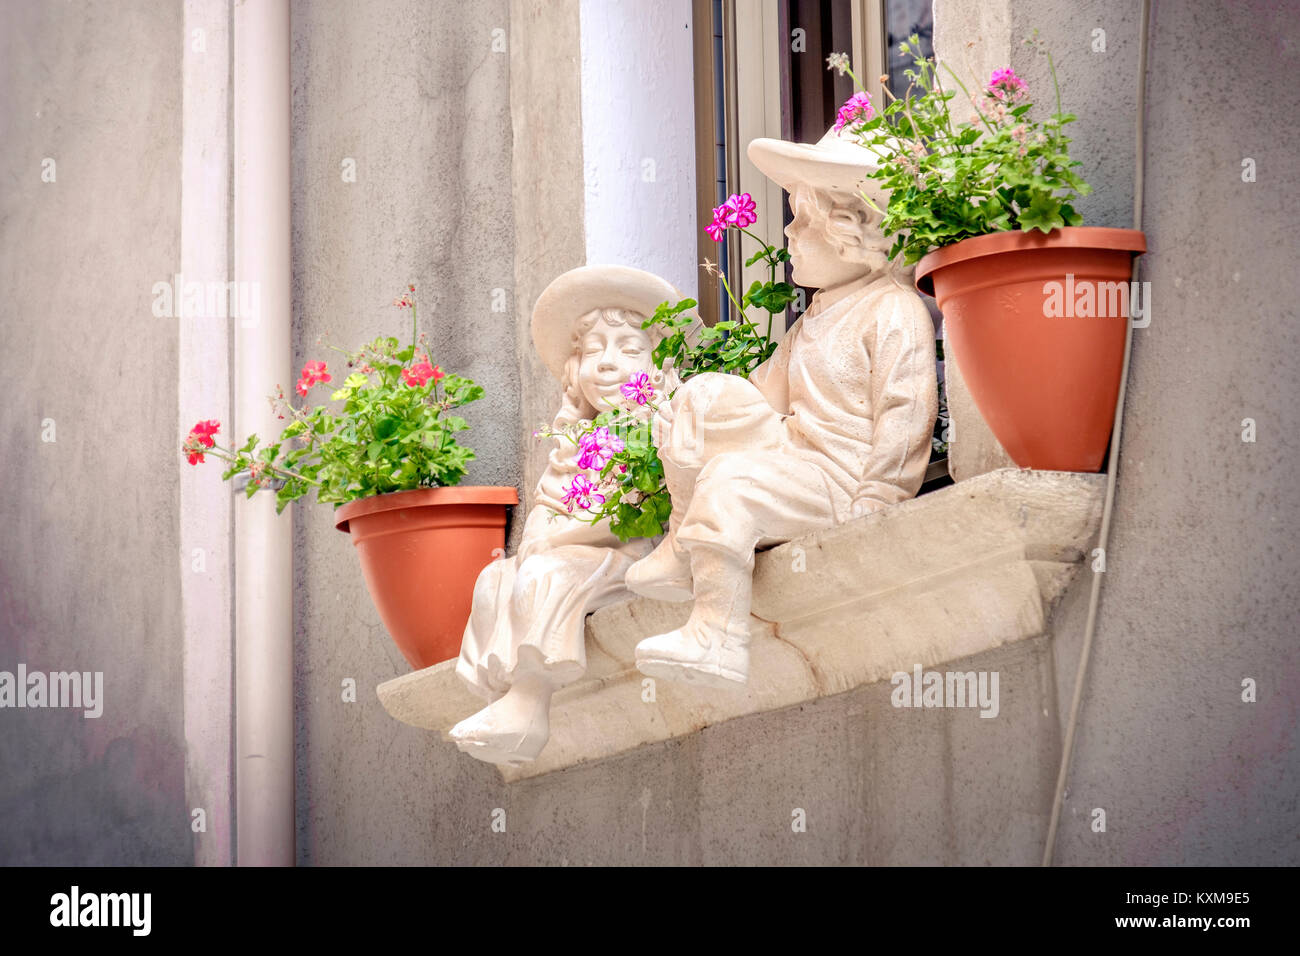 windowsill statues children background flowerpots balcony window sill - Stock Image